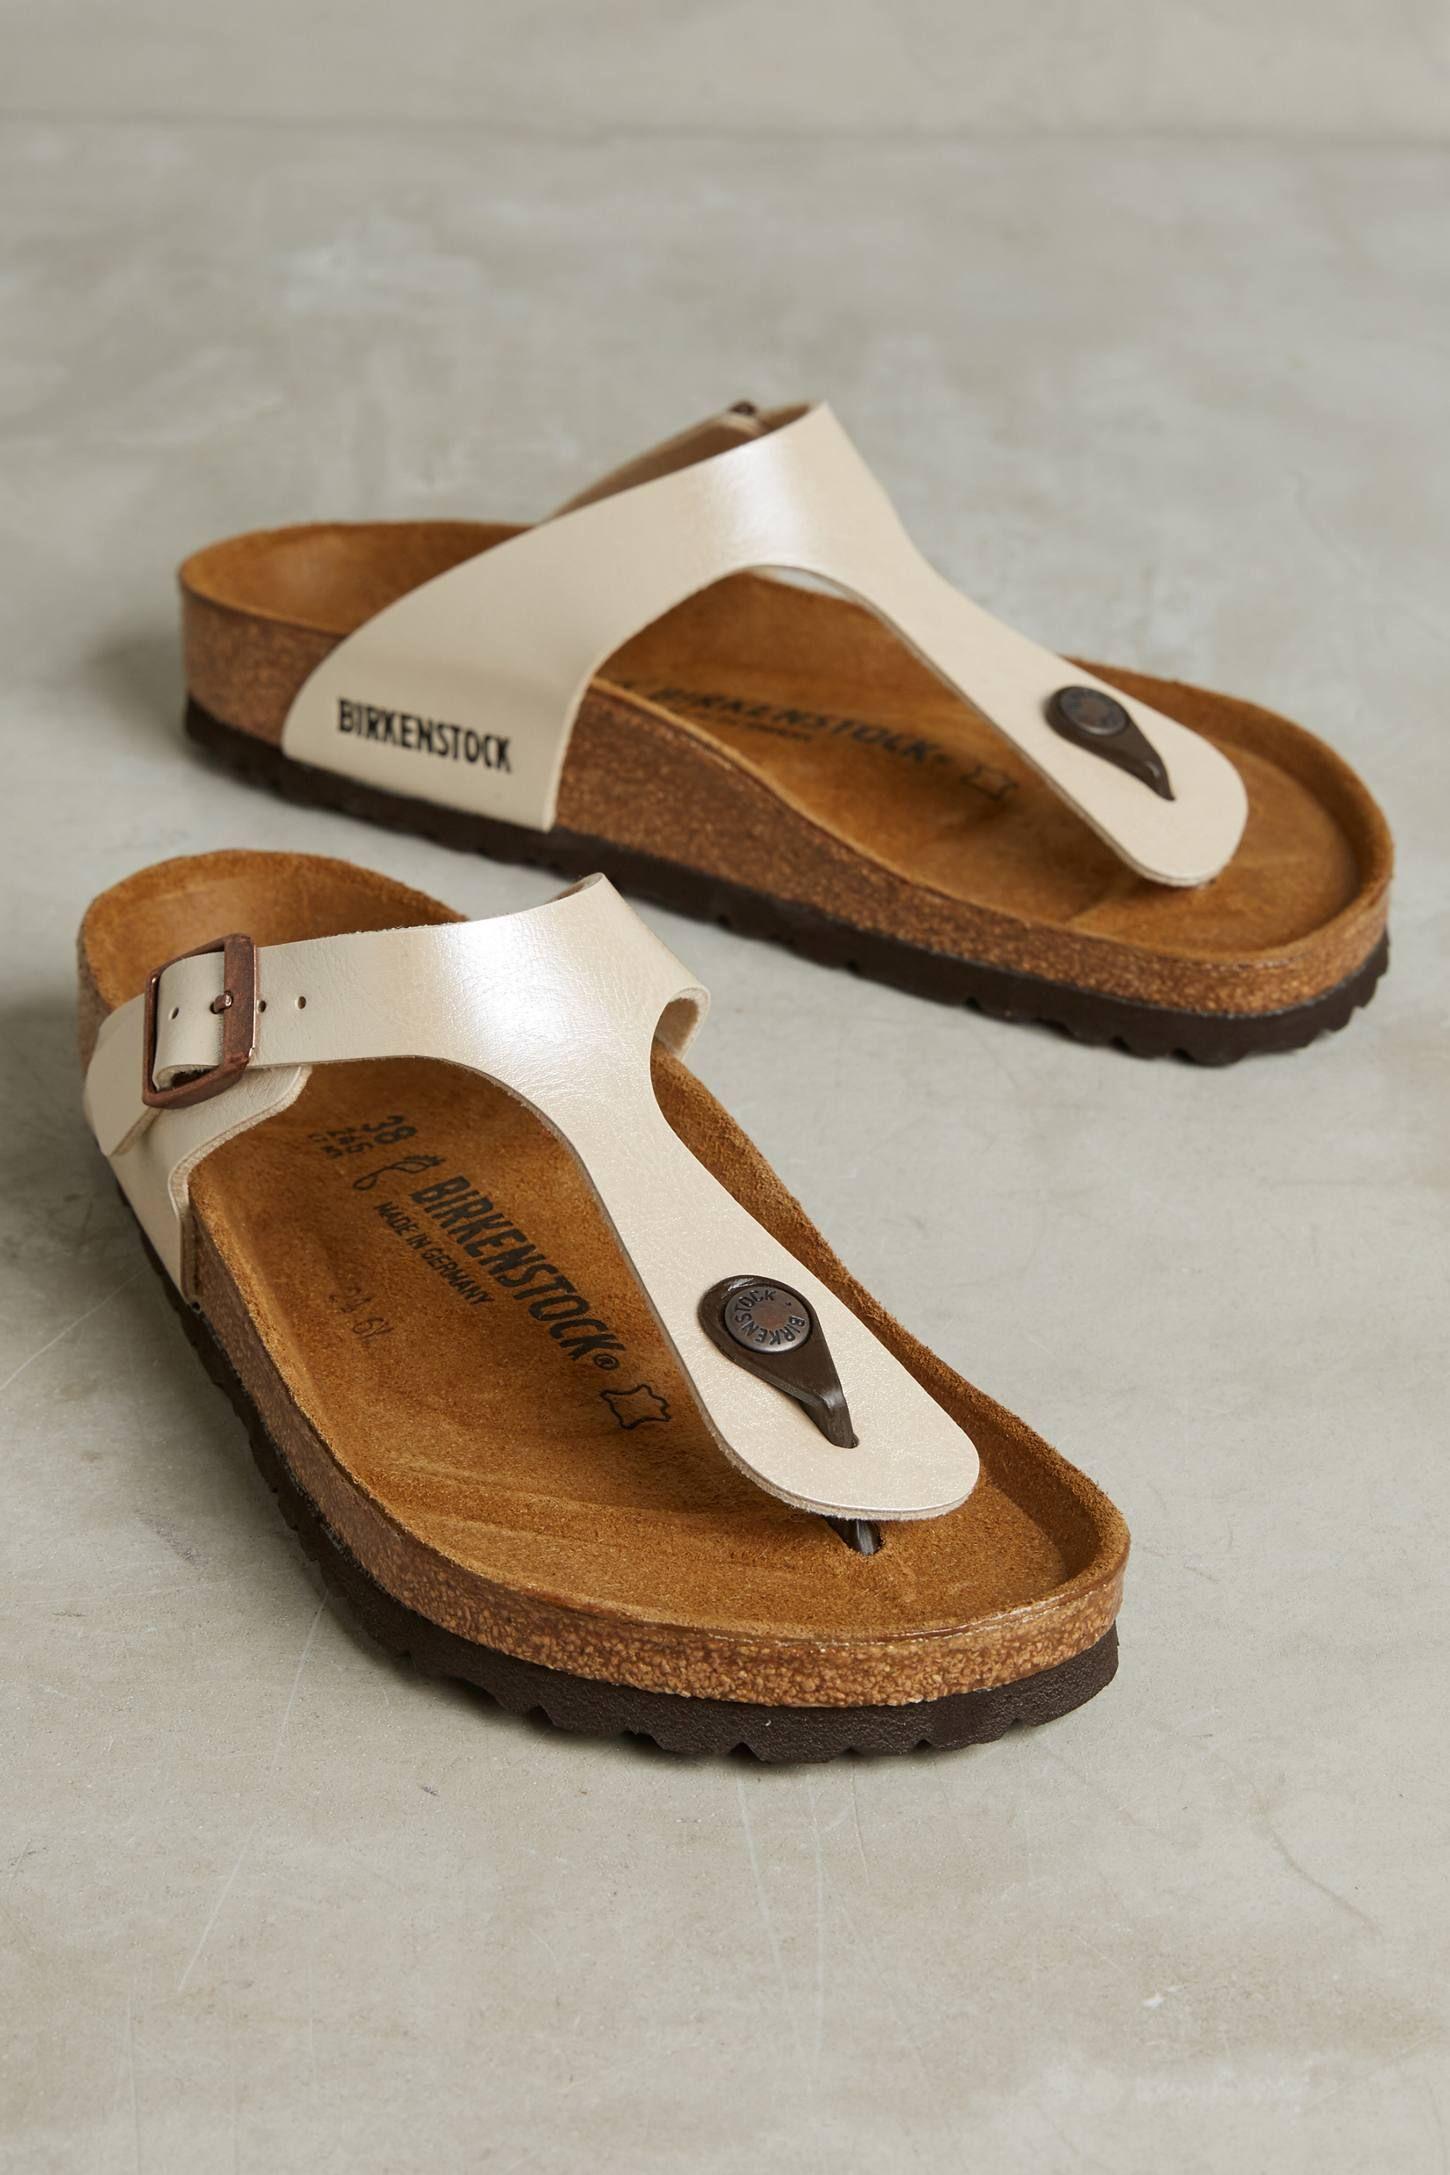 8a0deec5b Slide View  1  Birkenstock Gizeh Sandals